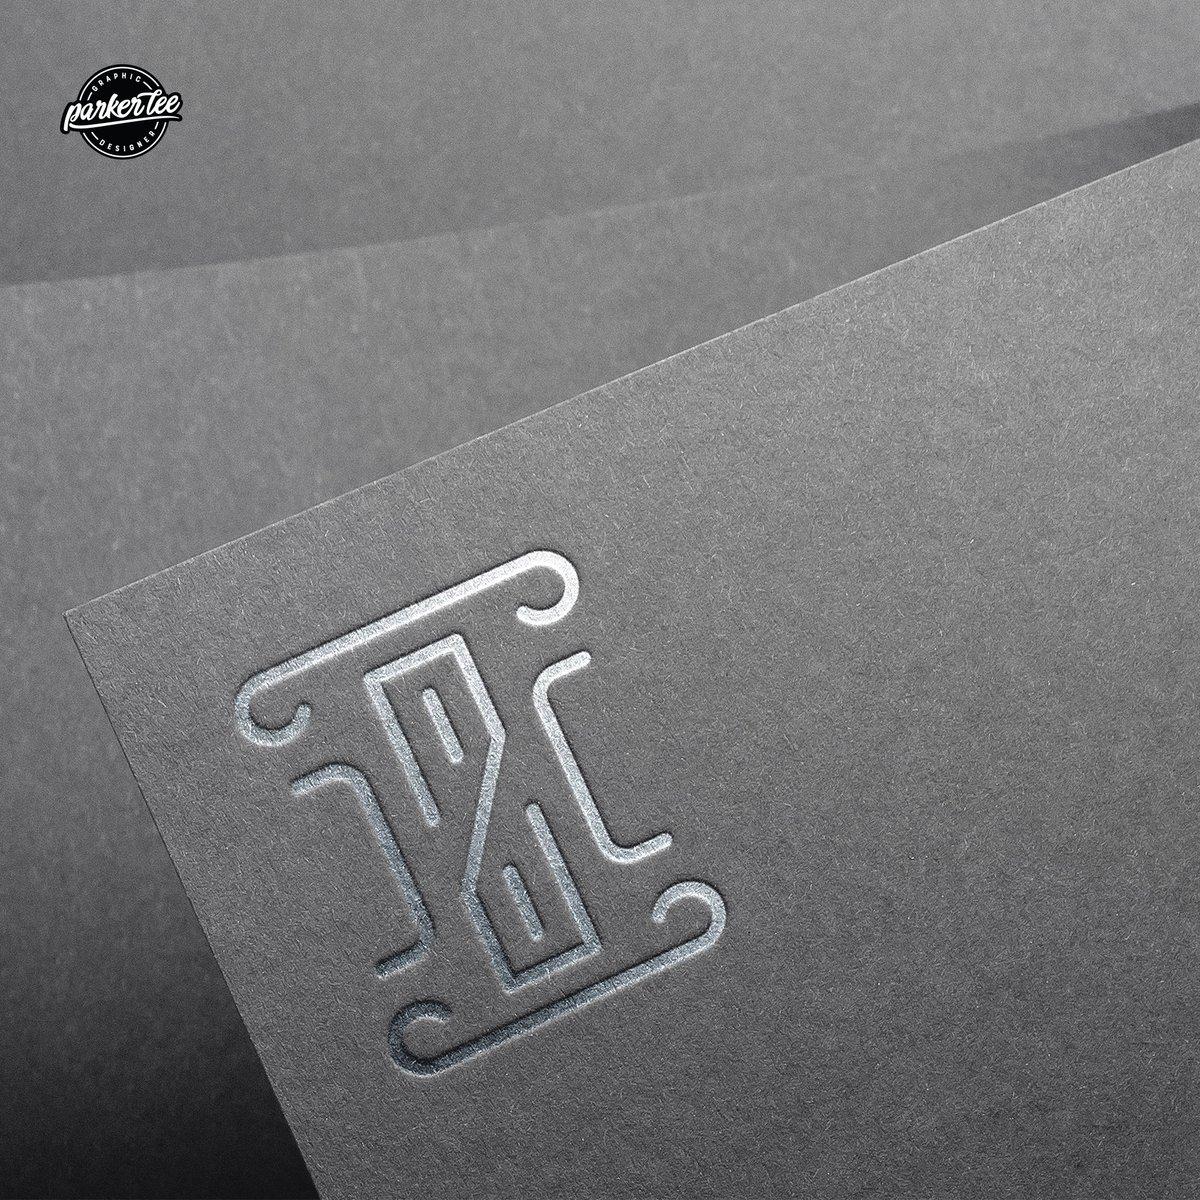 """Icon-ic"" Get it? . . . . . . . . . . . #Freelancer #Adobe #LogoLove #Branding #Chicago #Minimalism #Illustrator #Dribbble #Graphics #Photoshop #GraphicDesign #Art #Identity #LogoInspirations #LogoOfTheDay #Typography #Color #Design #FlatDesign #Logofolio #CreativeCloudpic.twitter.com/ibHnrlITsH"